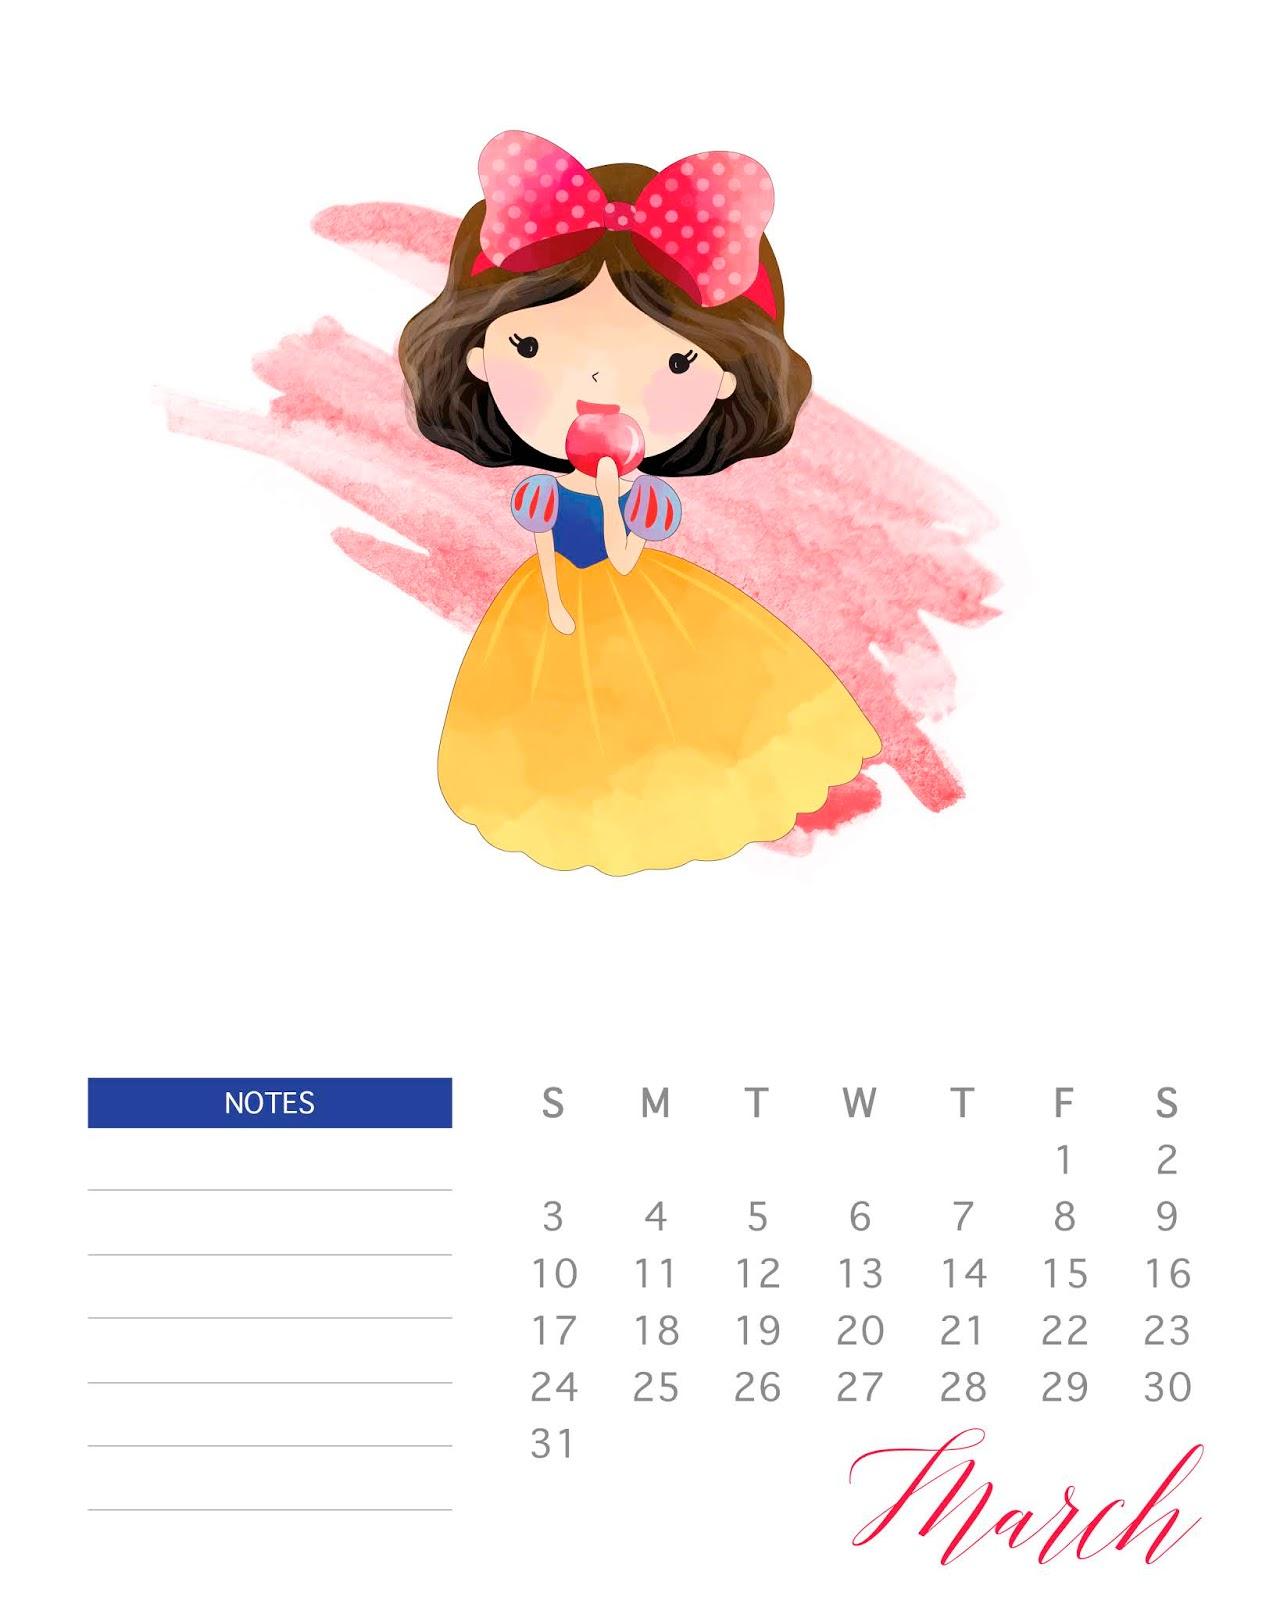 Calendario 2019 Disney Para Imprimir.Princesas Disney Calendario 2019 Para Imprimir Gratis